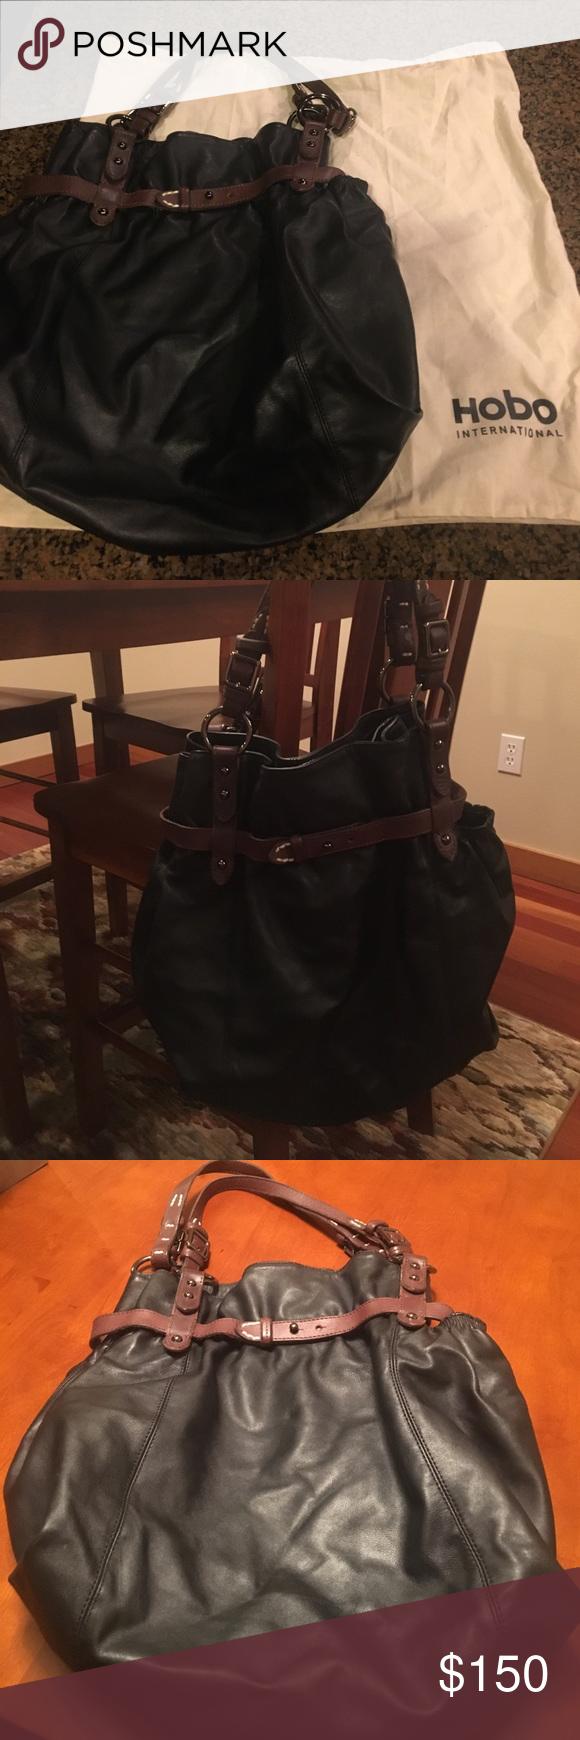 113f86d7bf8 Hobo International Black Bucket Bag   Bucket bags, Hobo bag and ...